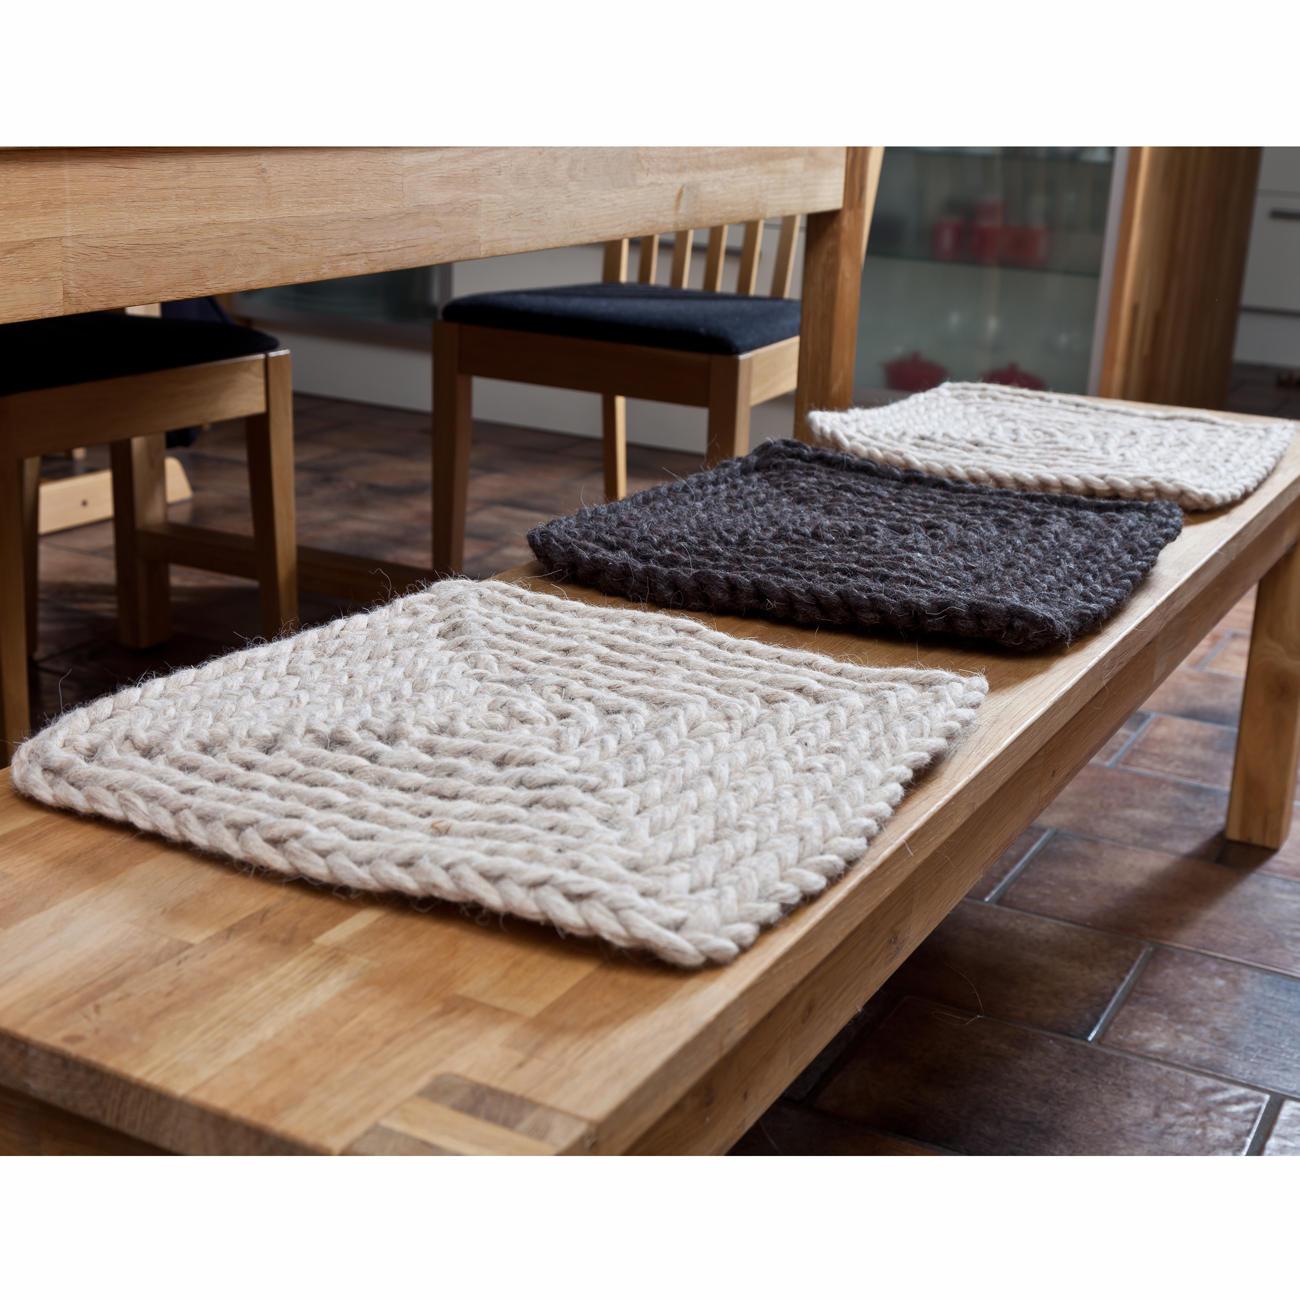 sitzunterlage 3er set 2 versch farben. Black Bedroom Furniture Sets. Home Design Ideas